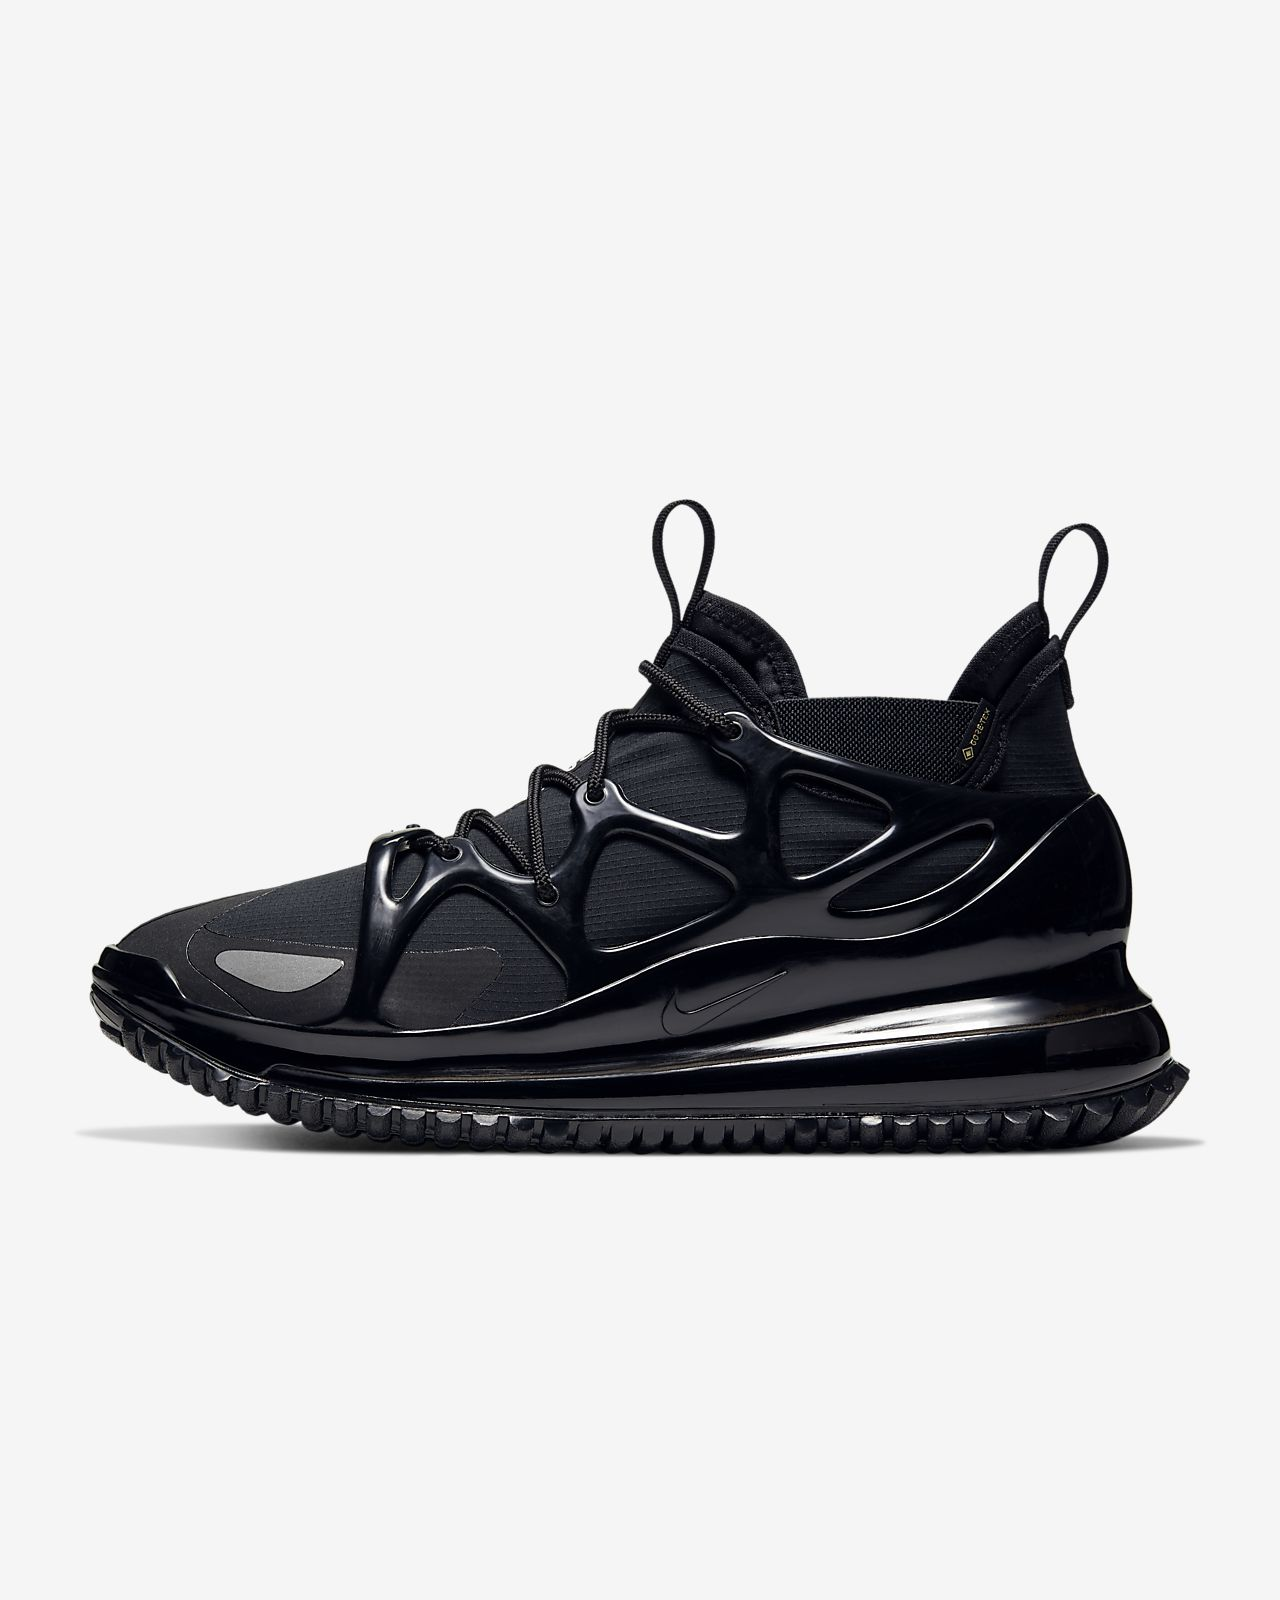 Nike Air Max 720 Horizon Gore Tex Black Vast Grey BQ5808 002